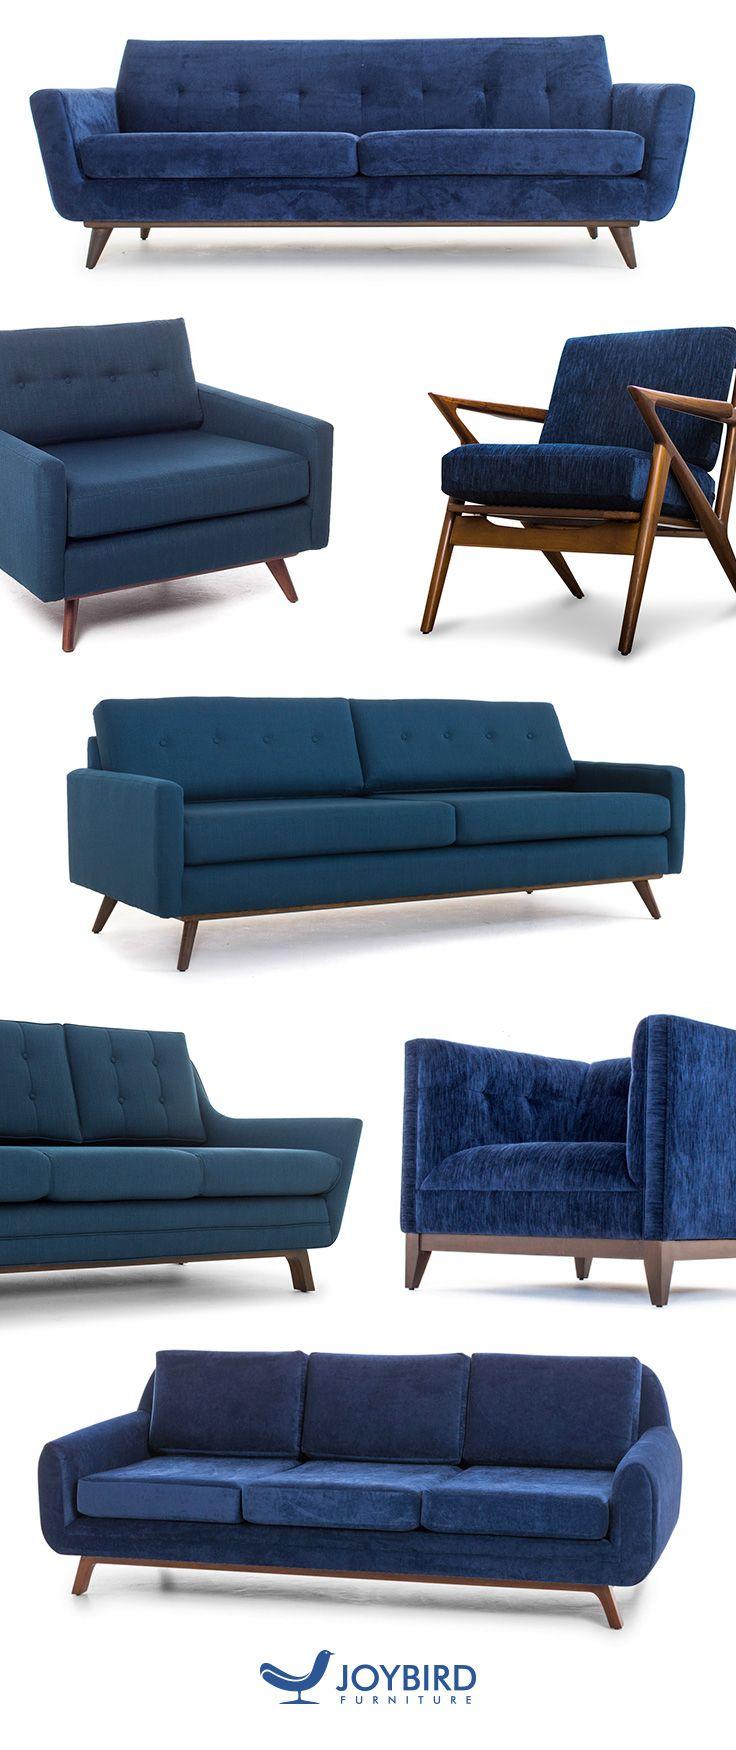 Best 25+ Quality furniture ideas on Pinterest